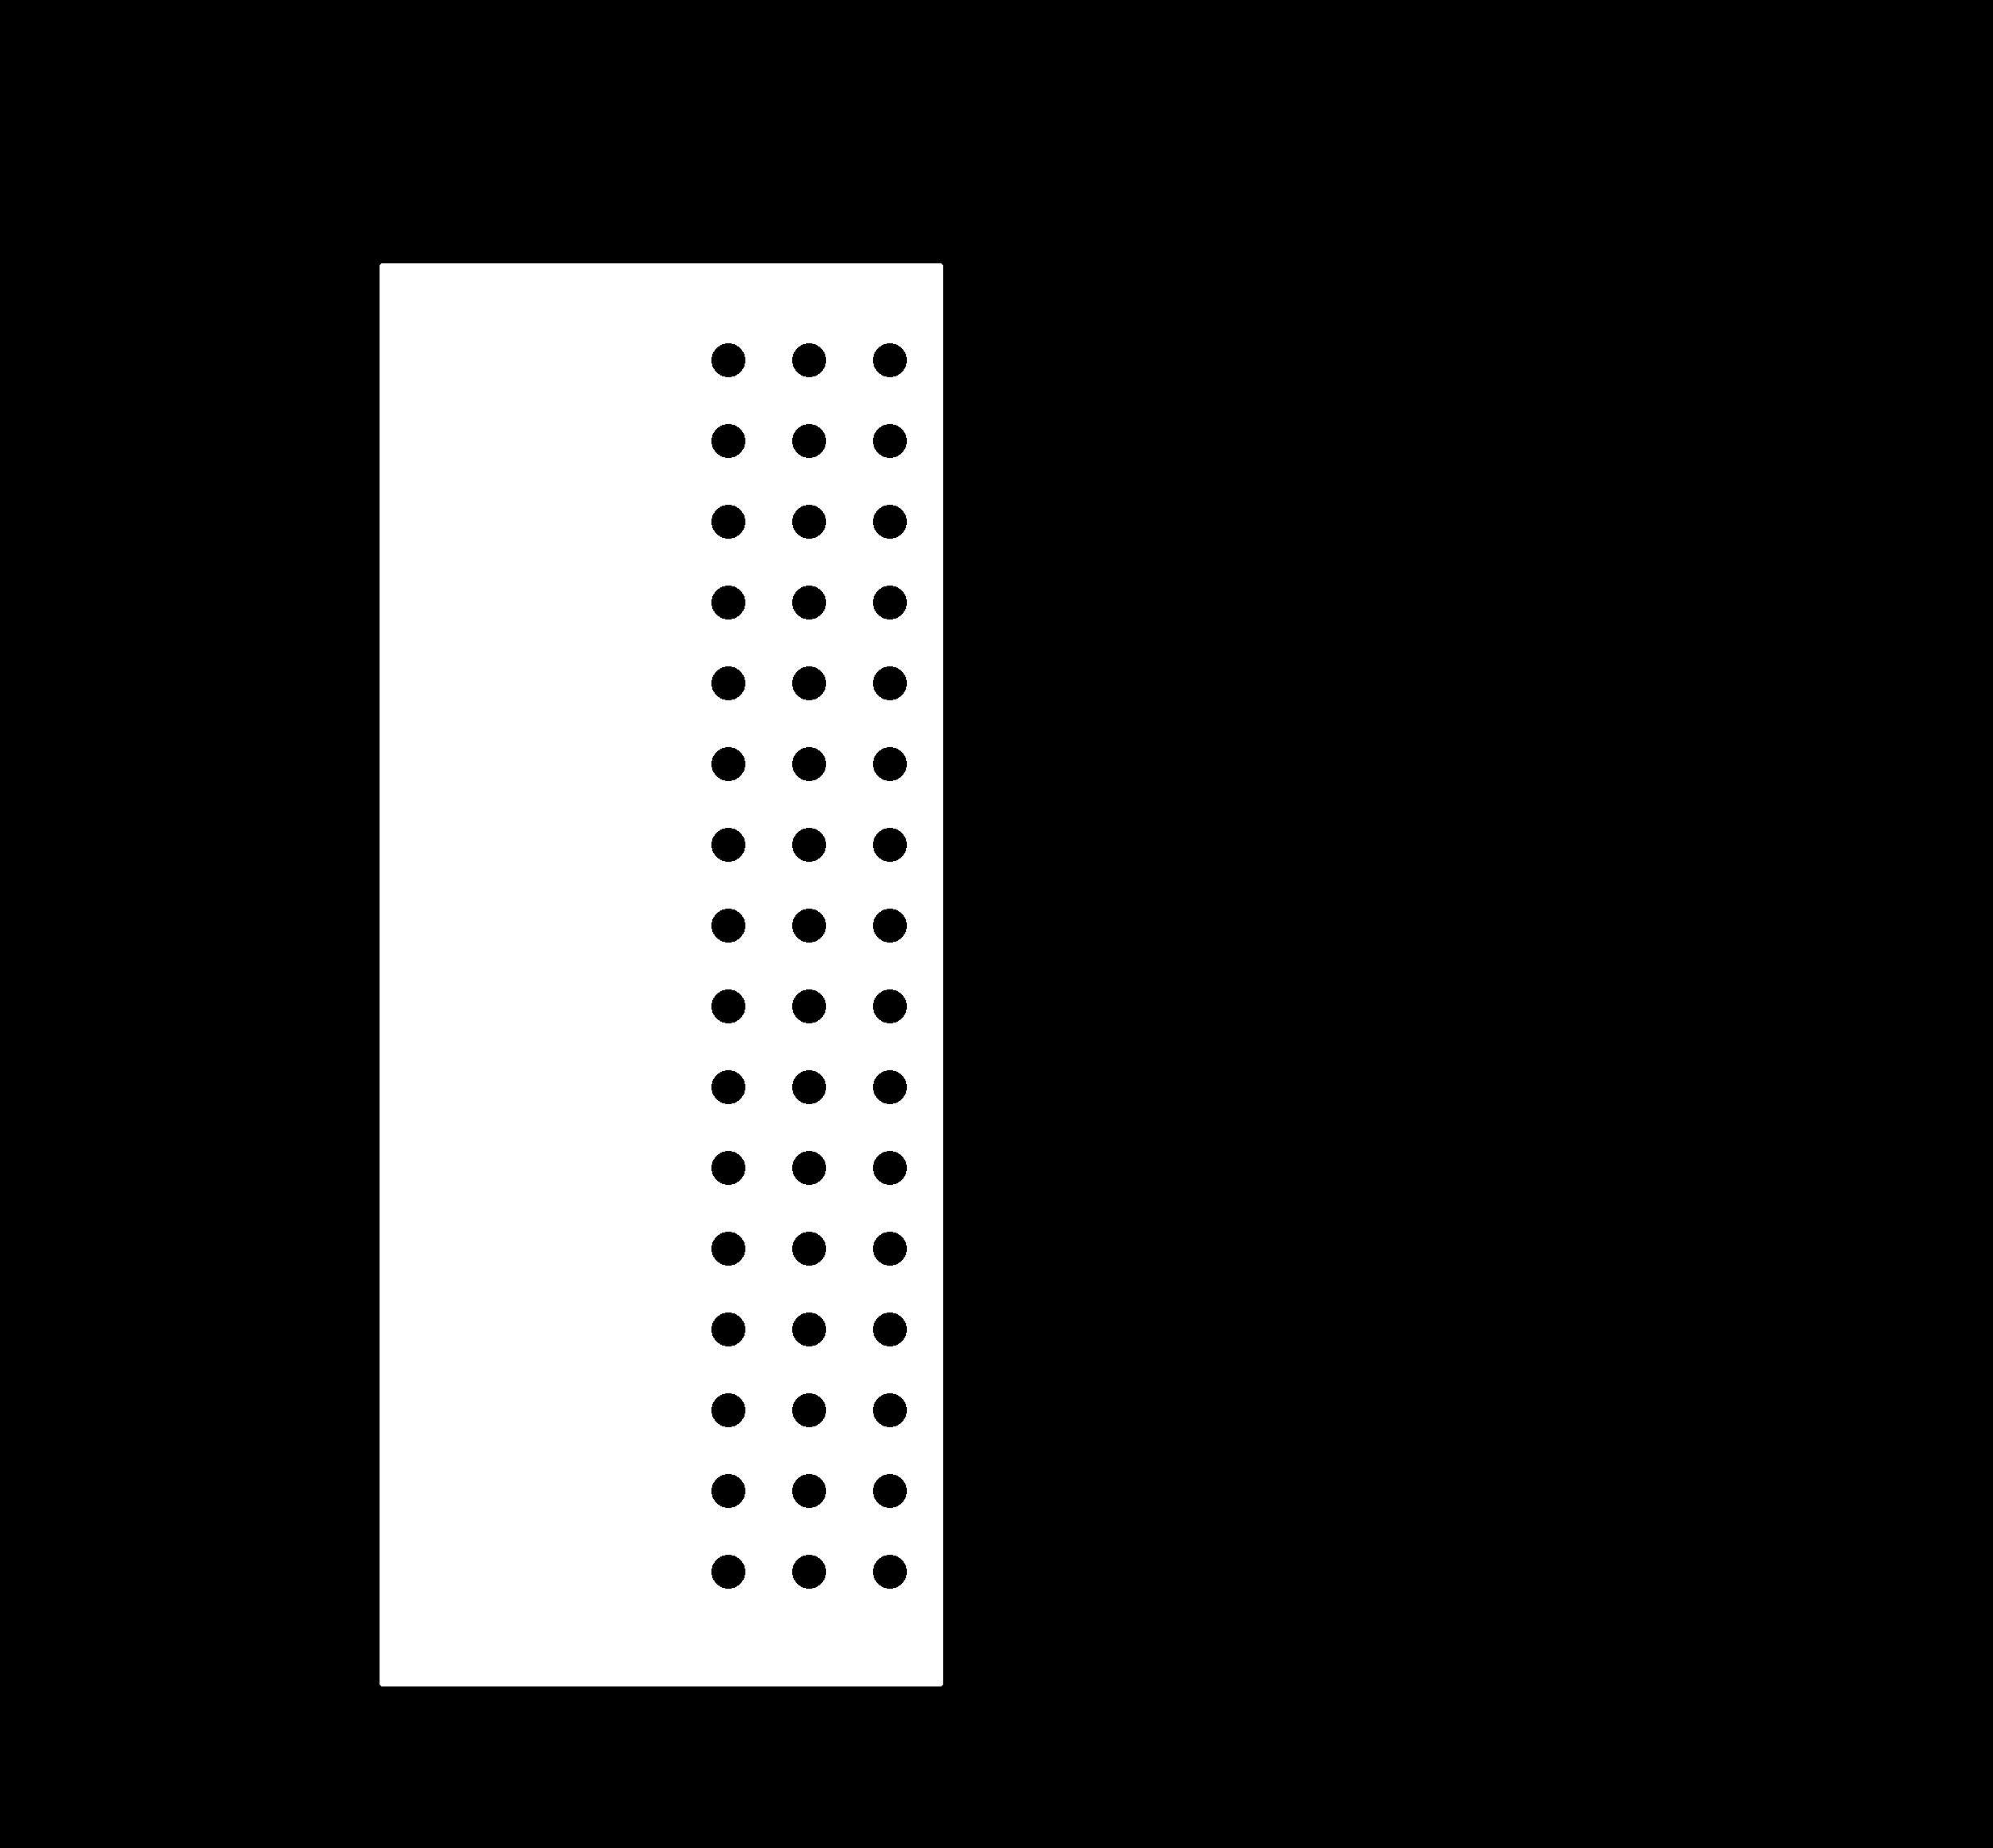 static/designs/12_temp_control_cutout.png